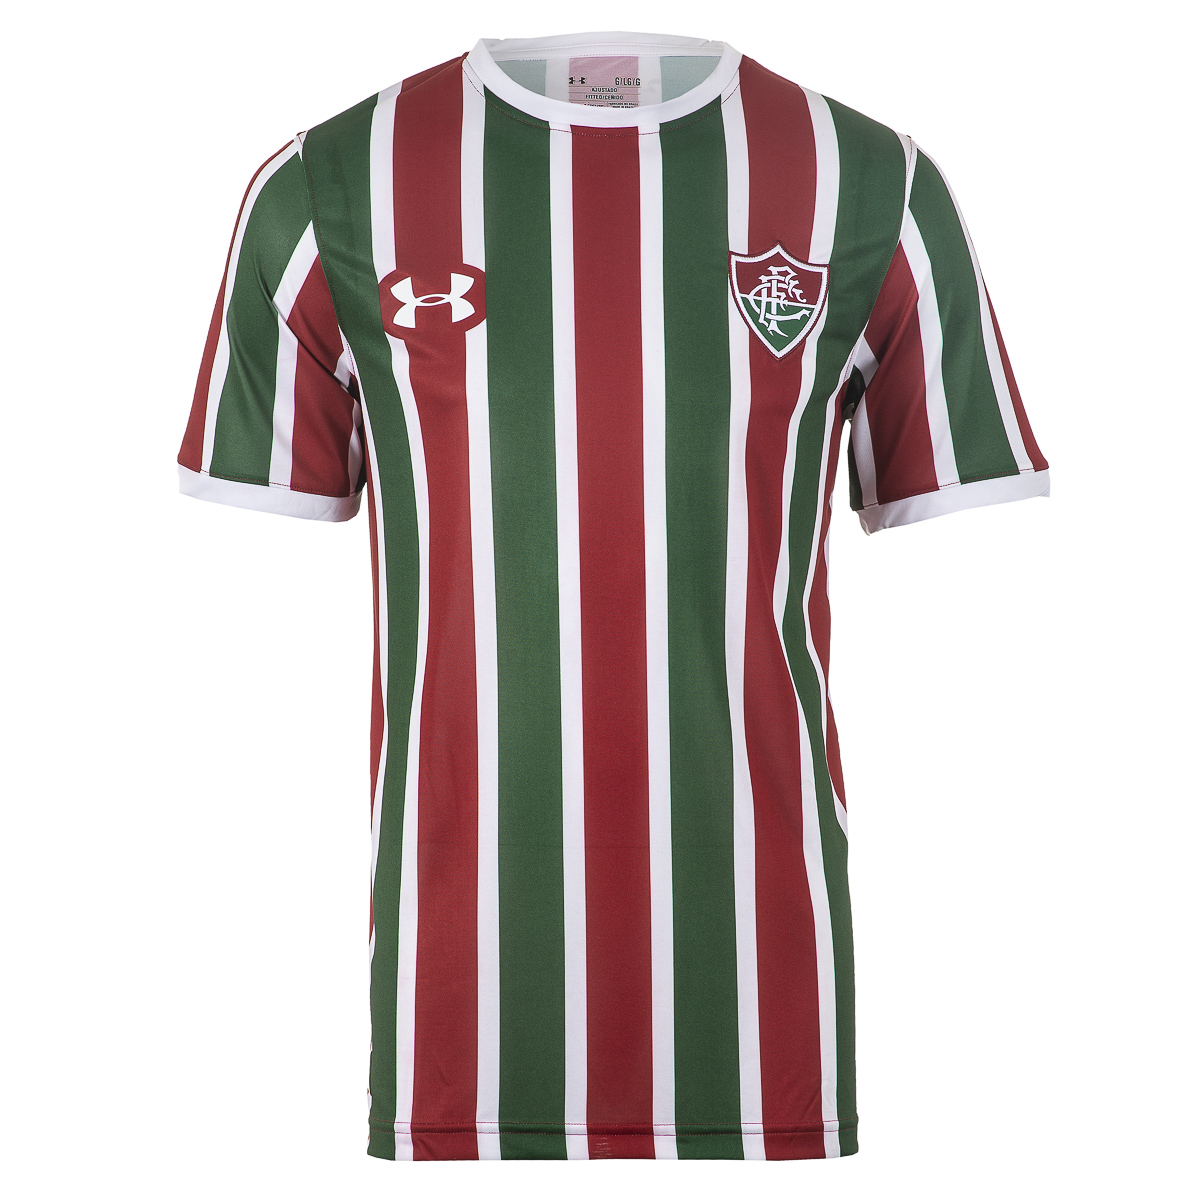 Camisa Masc. Under Armour Fluminense Of.1 Tricolor Futebol - Verde/Bordô